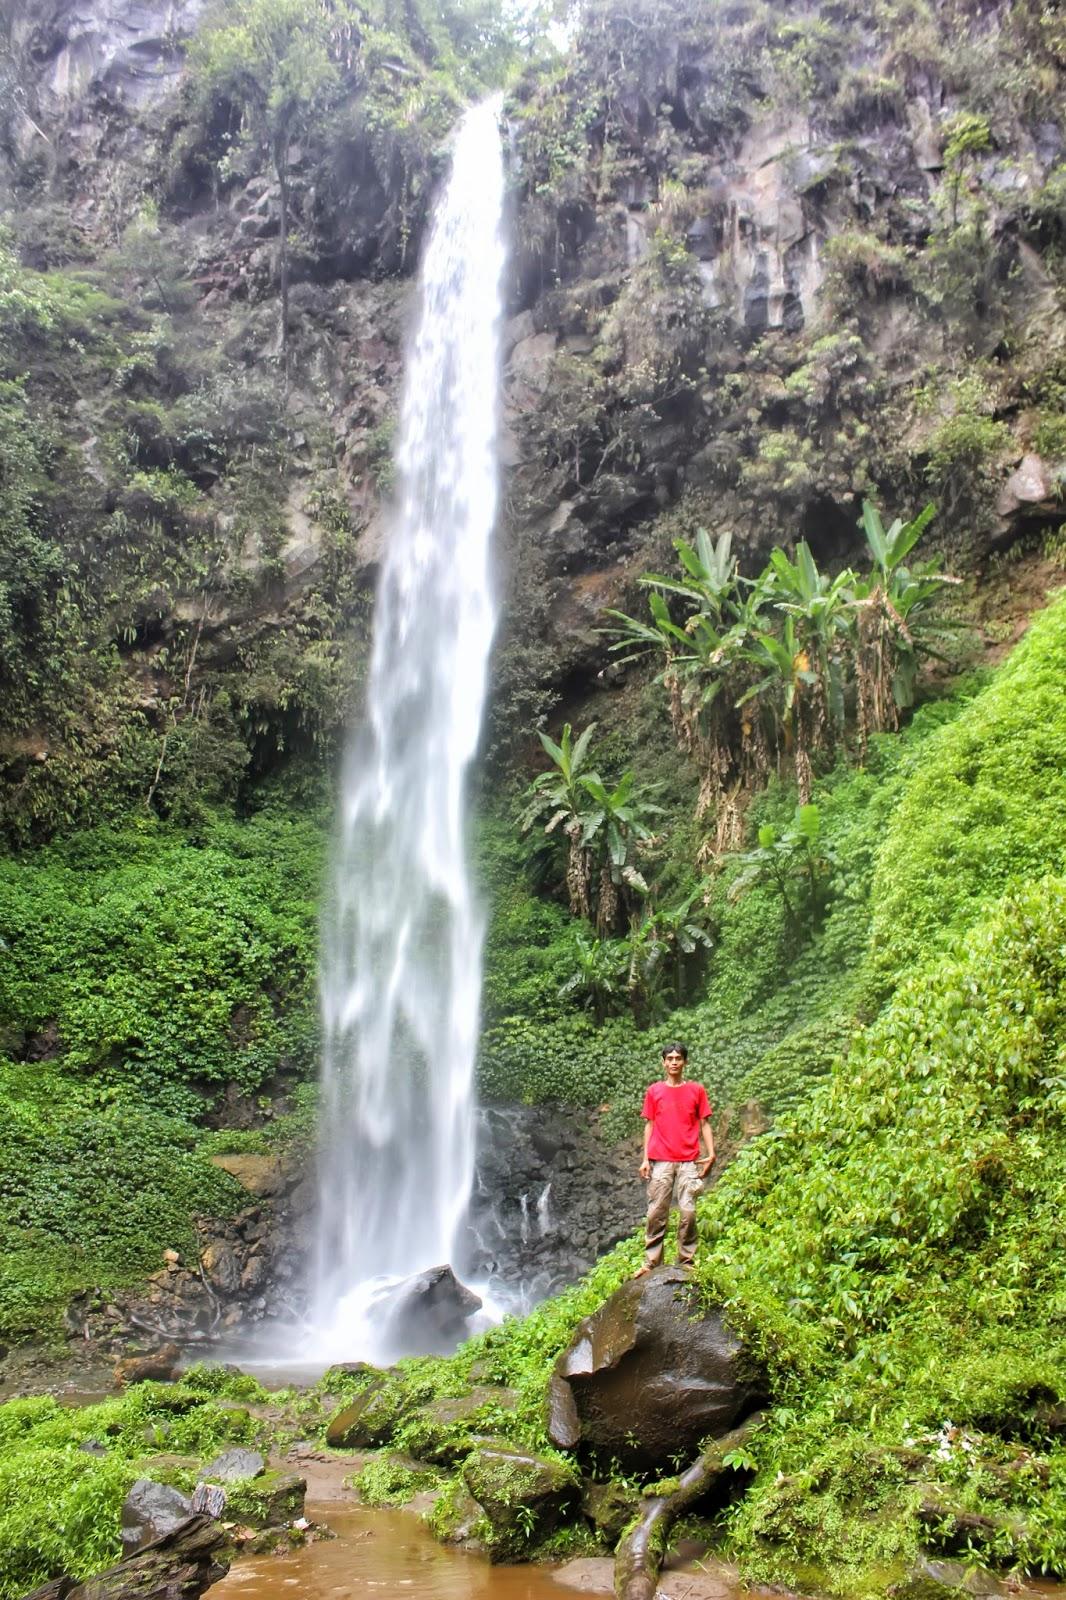 Mojokerto Indonesia  City pictures : Download image Air Terjun Mojokerto Jawa Timur Indonesia PC, Android ...